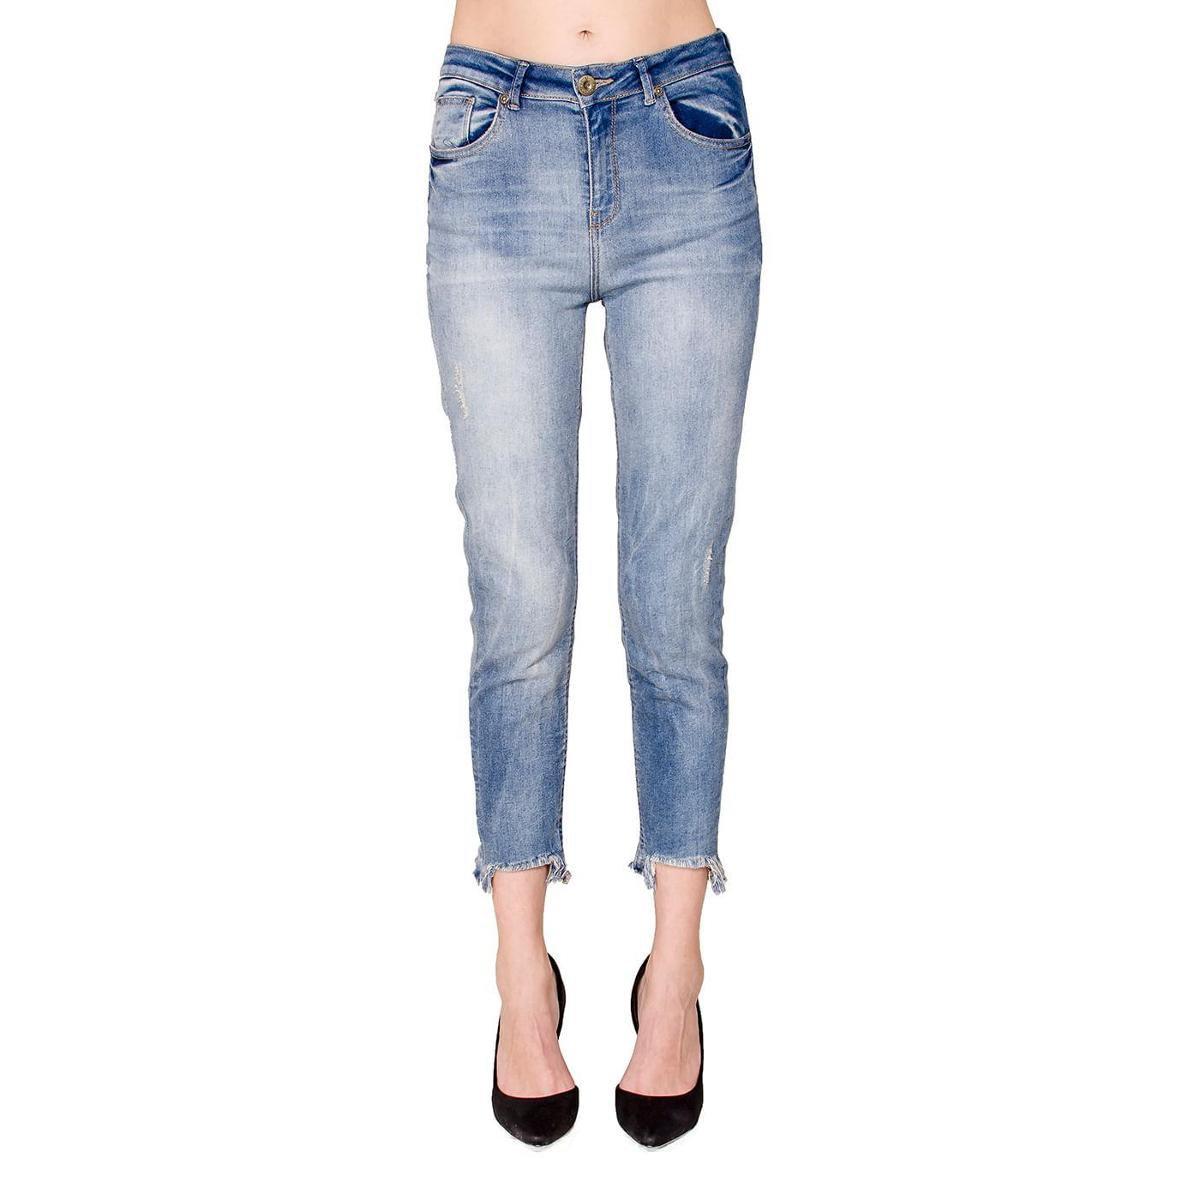 Calça Jeans Barra Assimétrica Alphorria - Azul jjOzn8l8